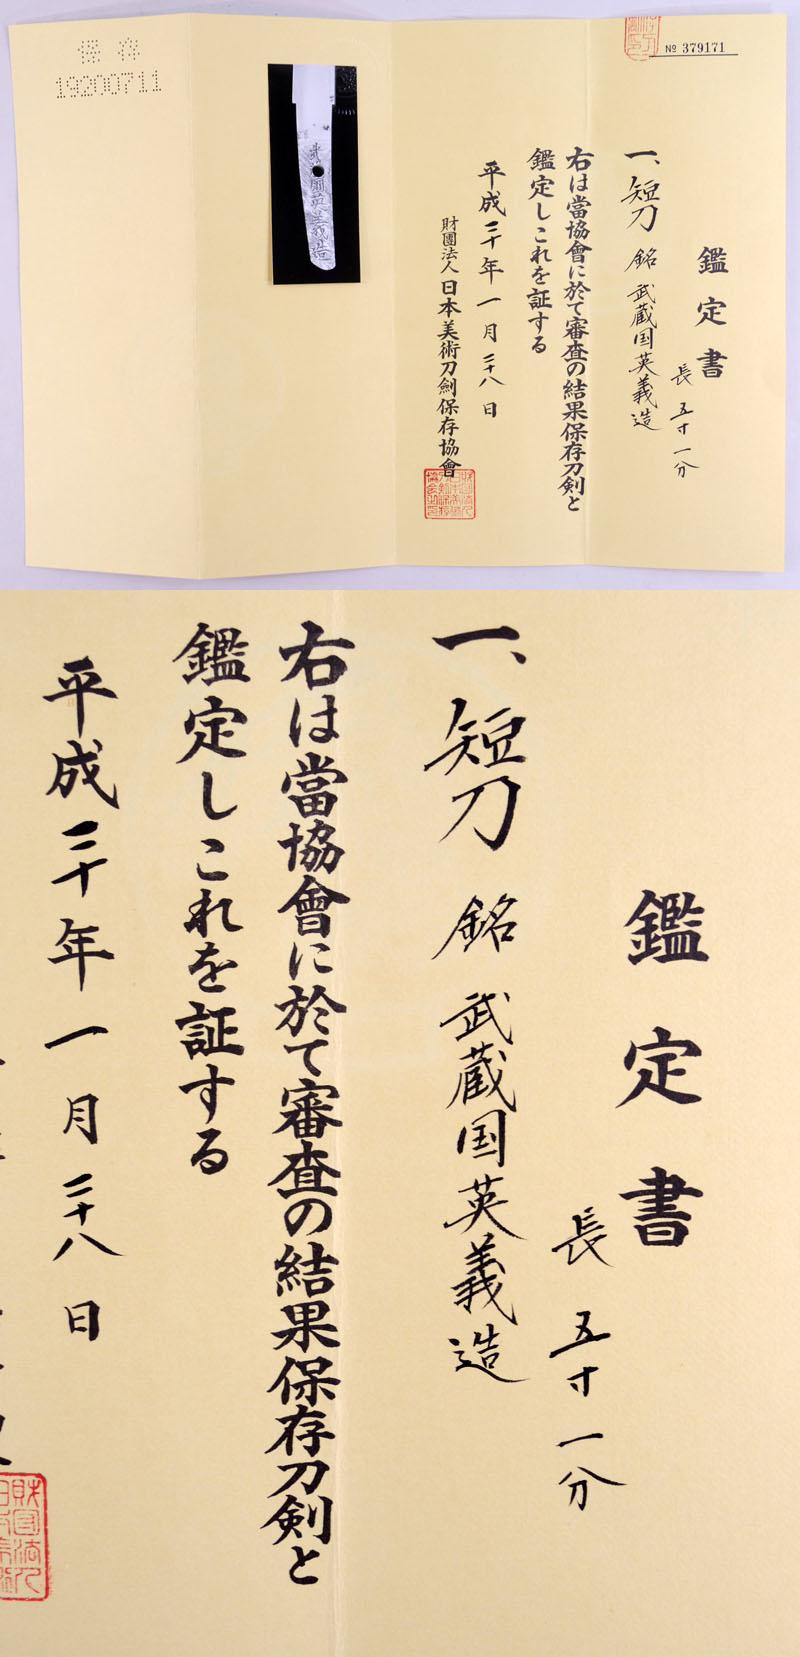 武蔵国英義造 Picture of Certificate